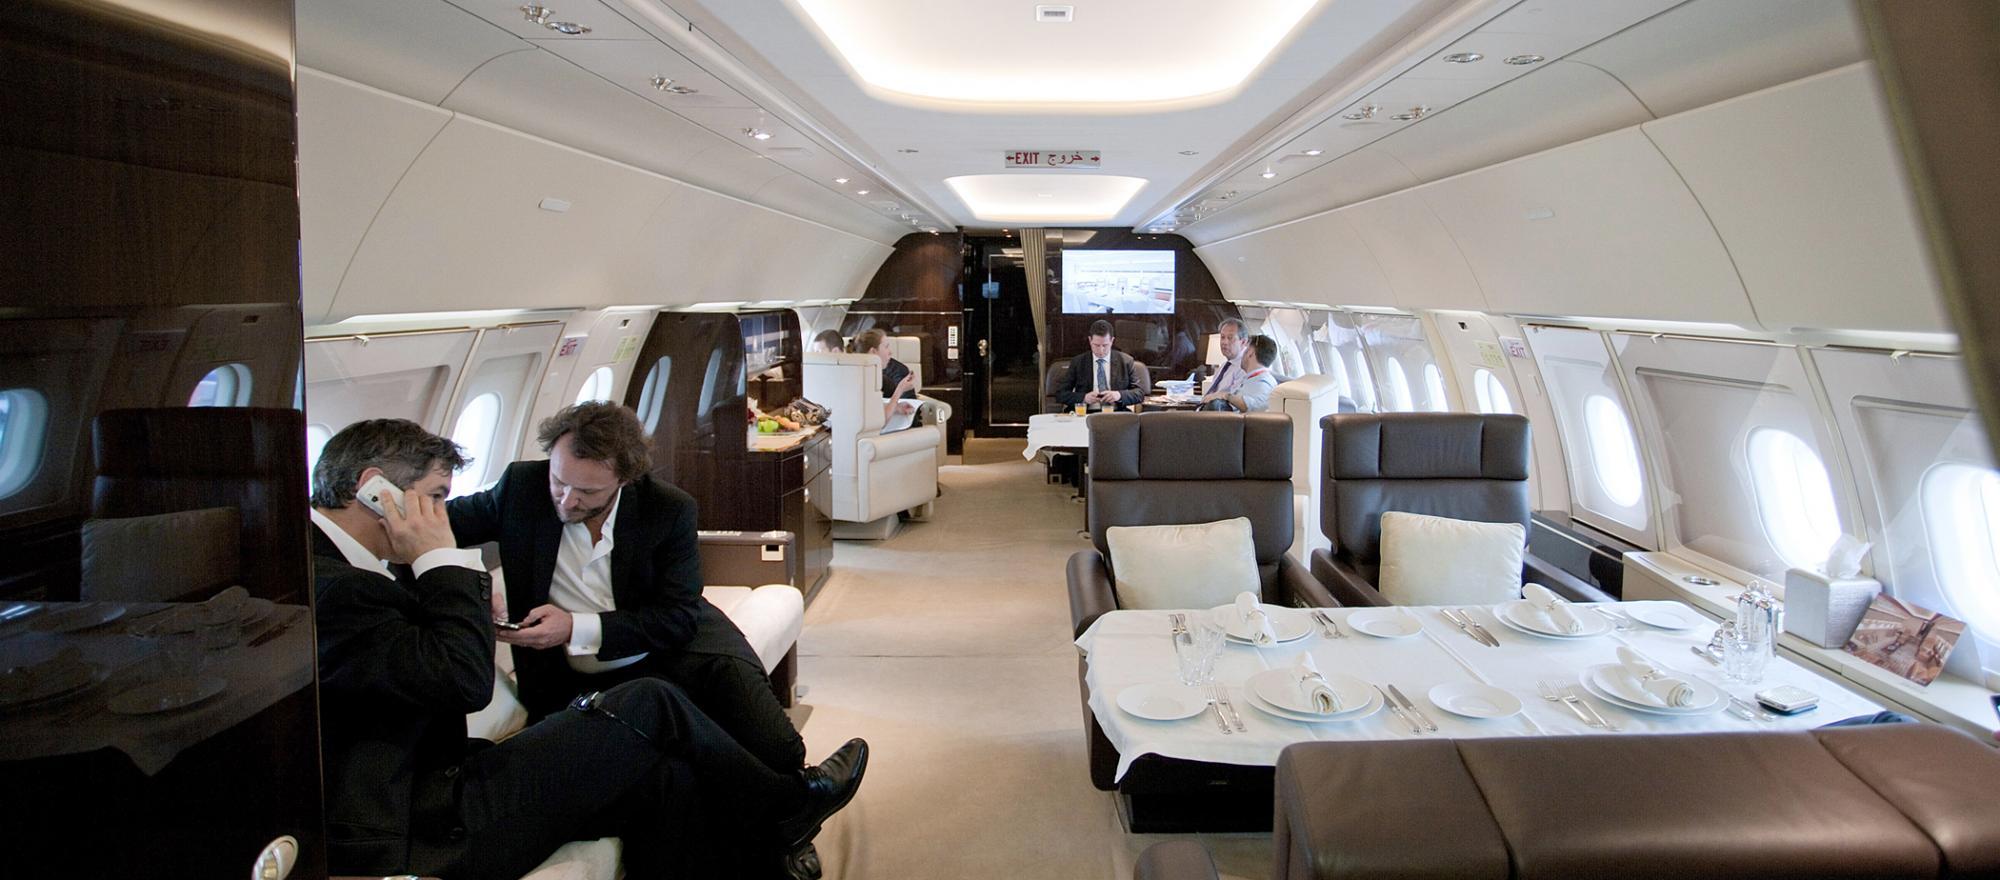 aereo-aziendale-vantaggi